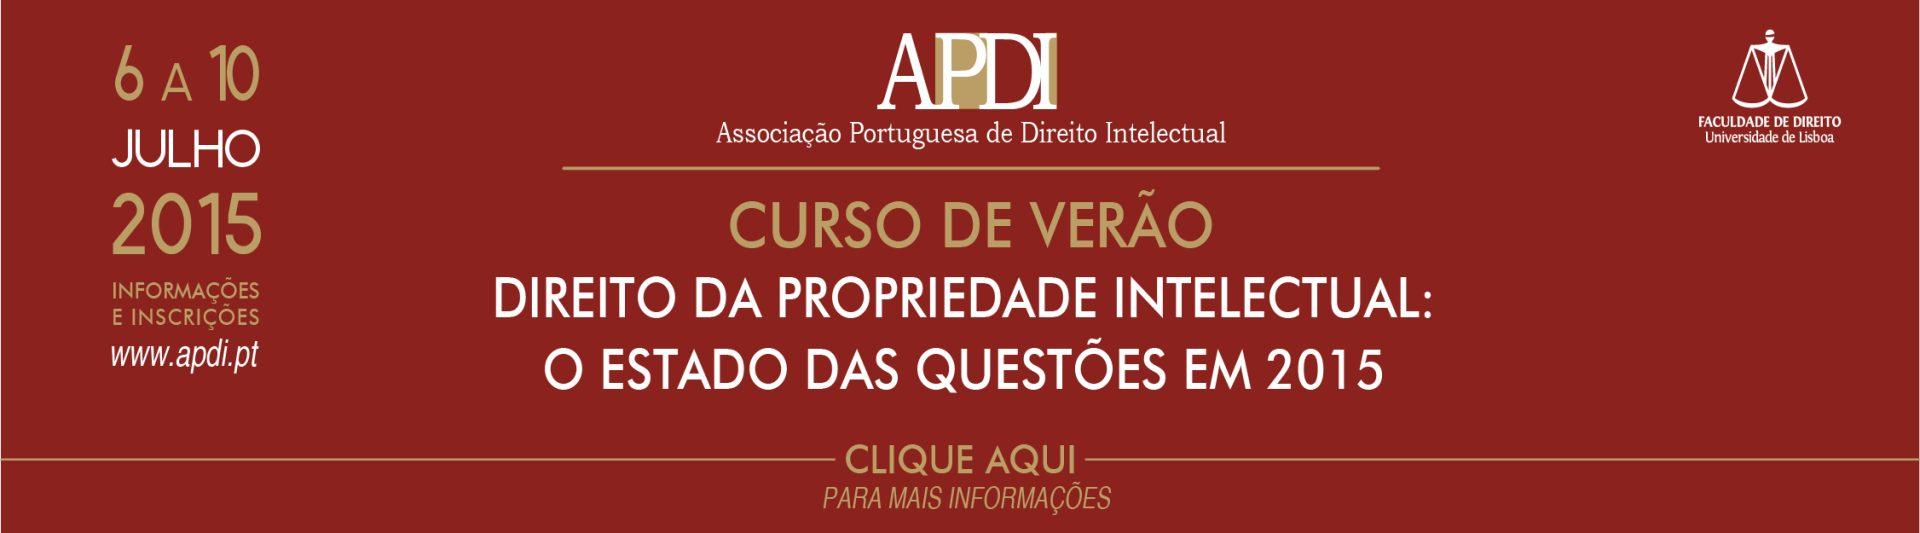 APDI-banner-curso-verao